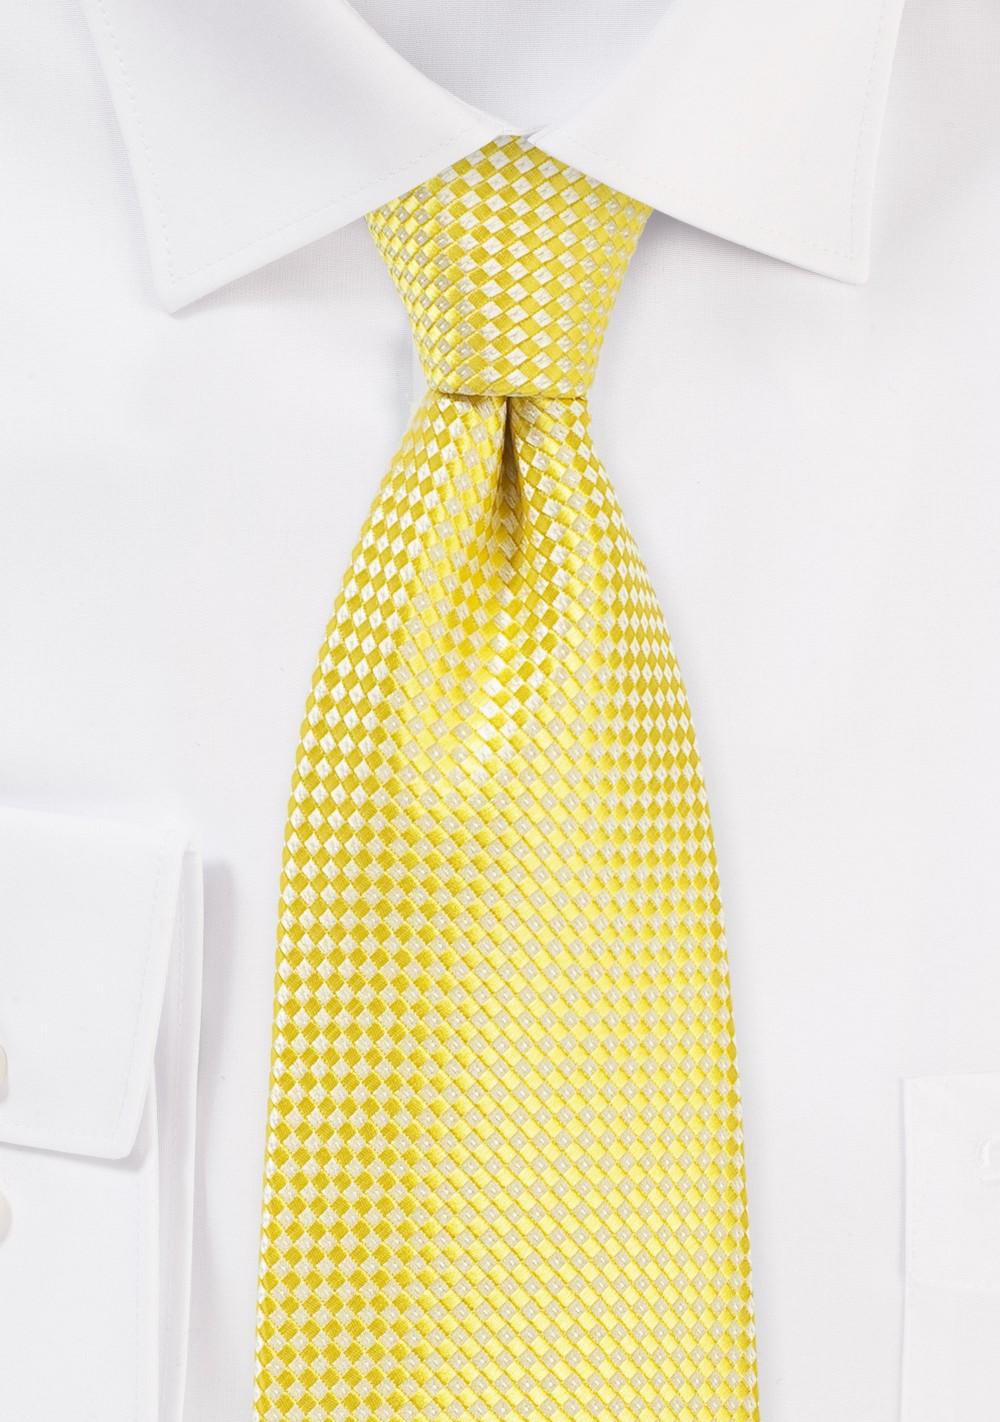 Vibrant Yellow Tie in XL Length